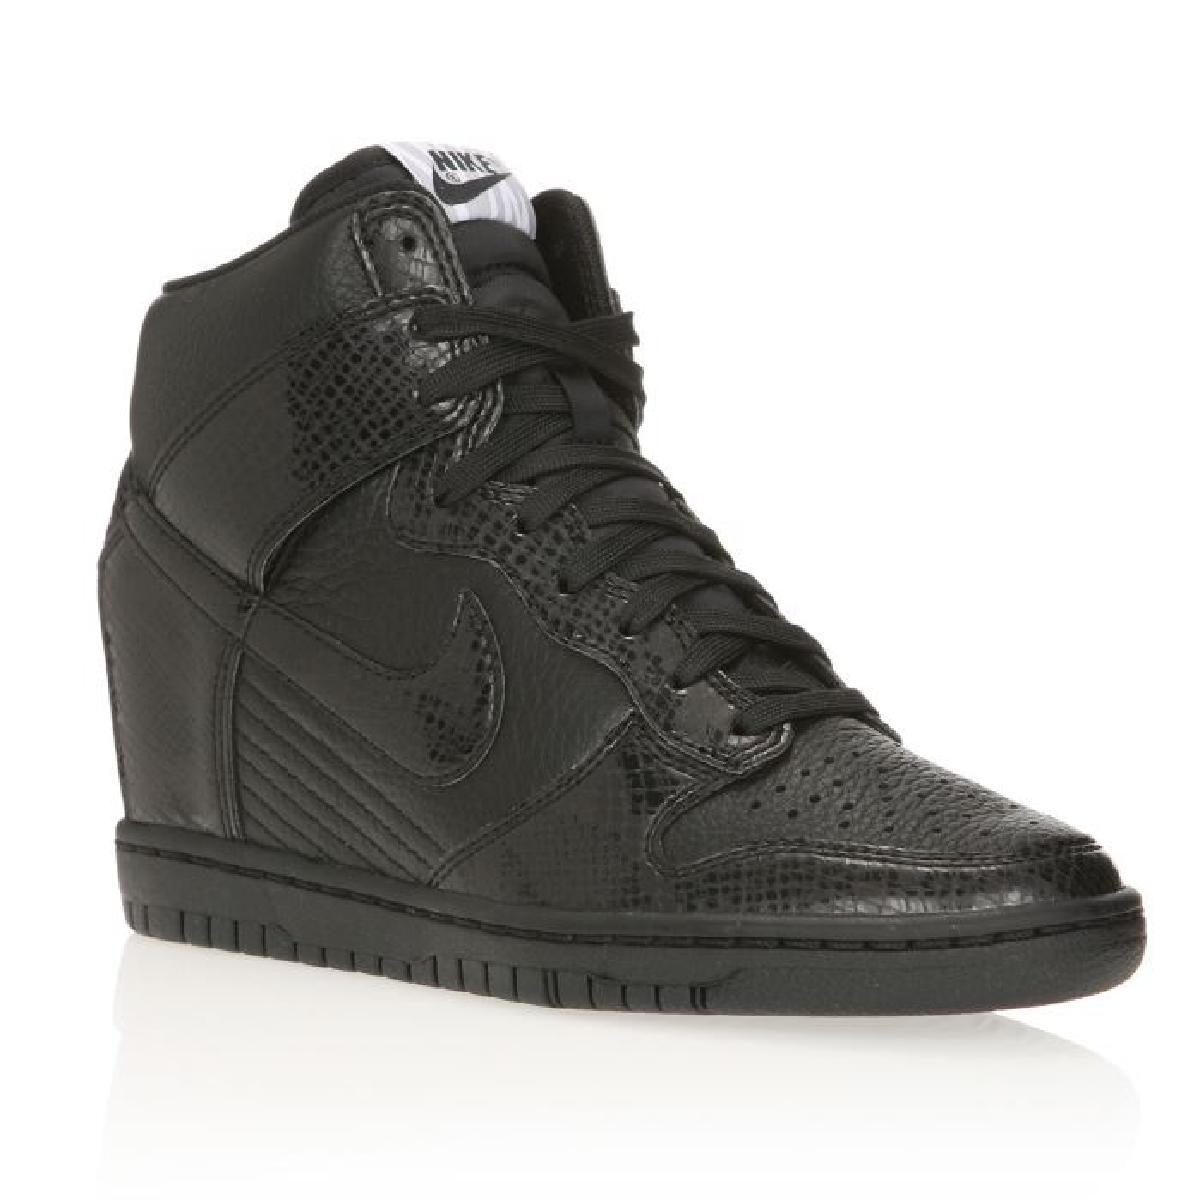 Chaussure compensee nike noir